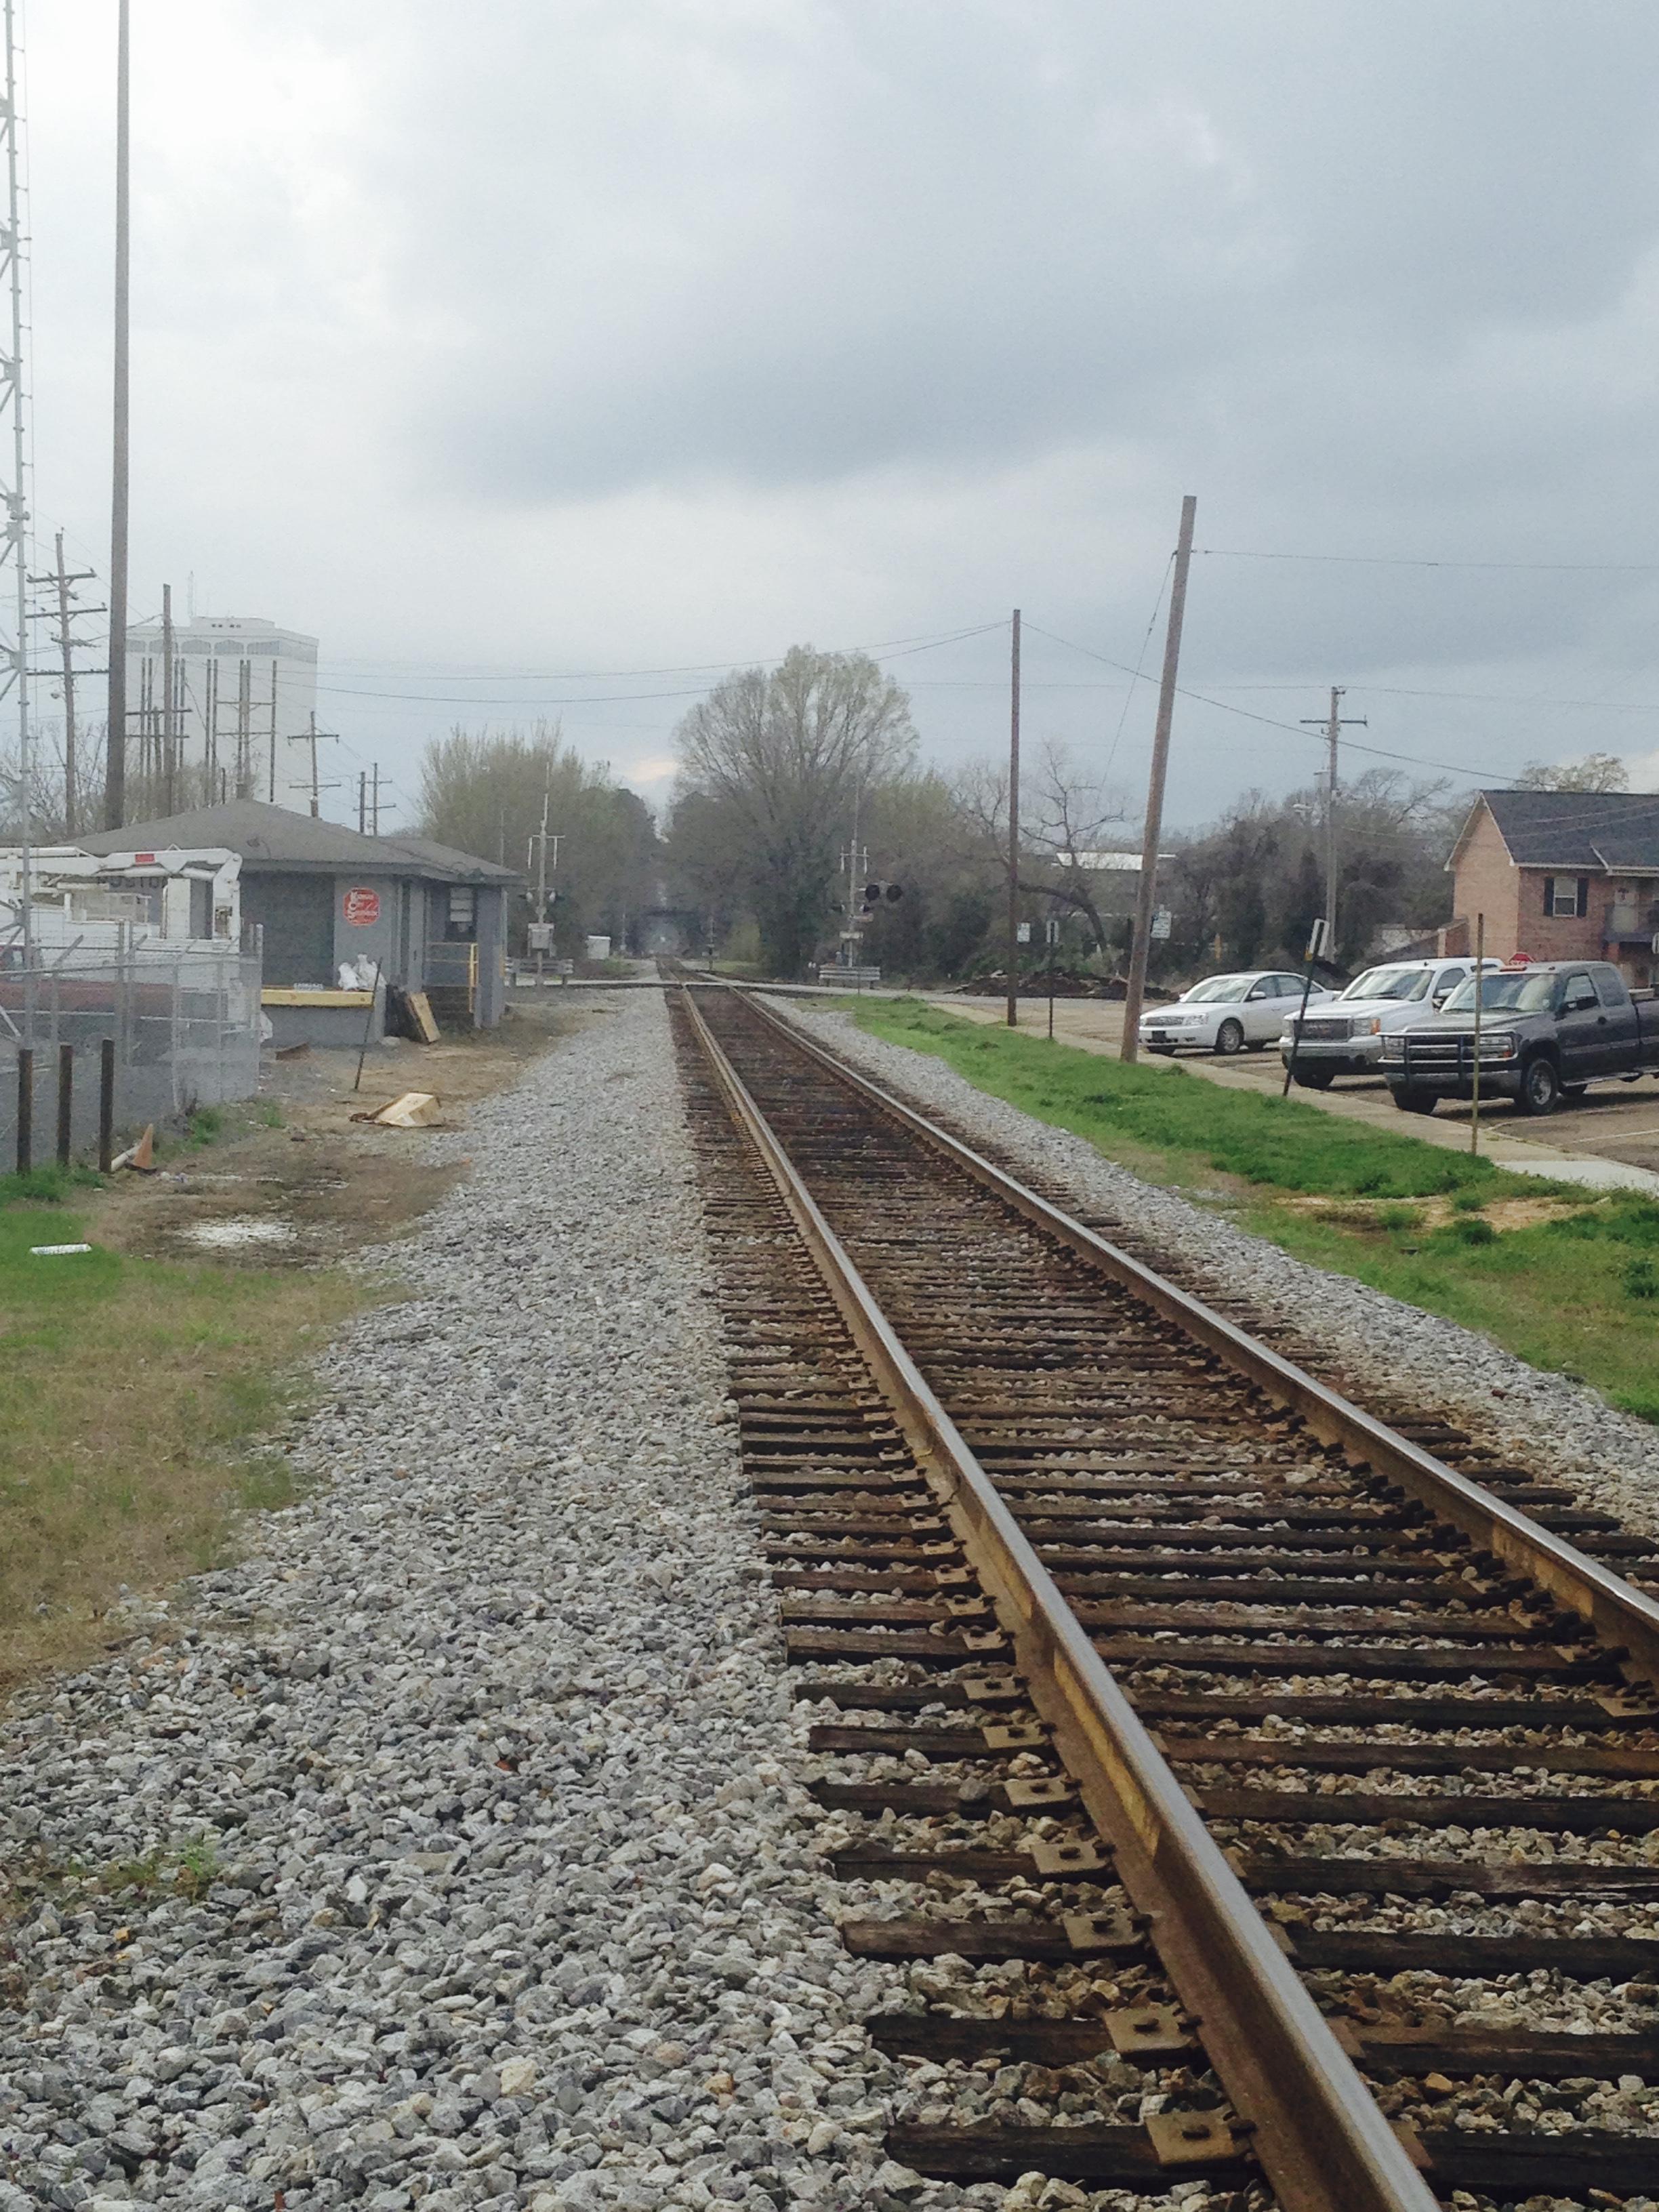 Obligatory small town railroad shot.